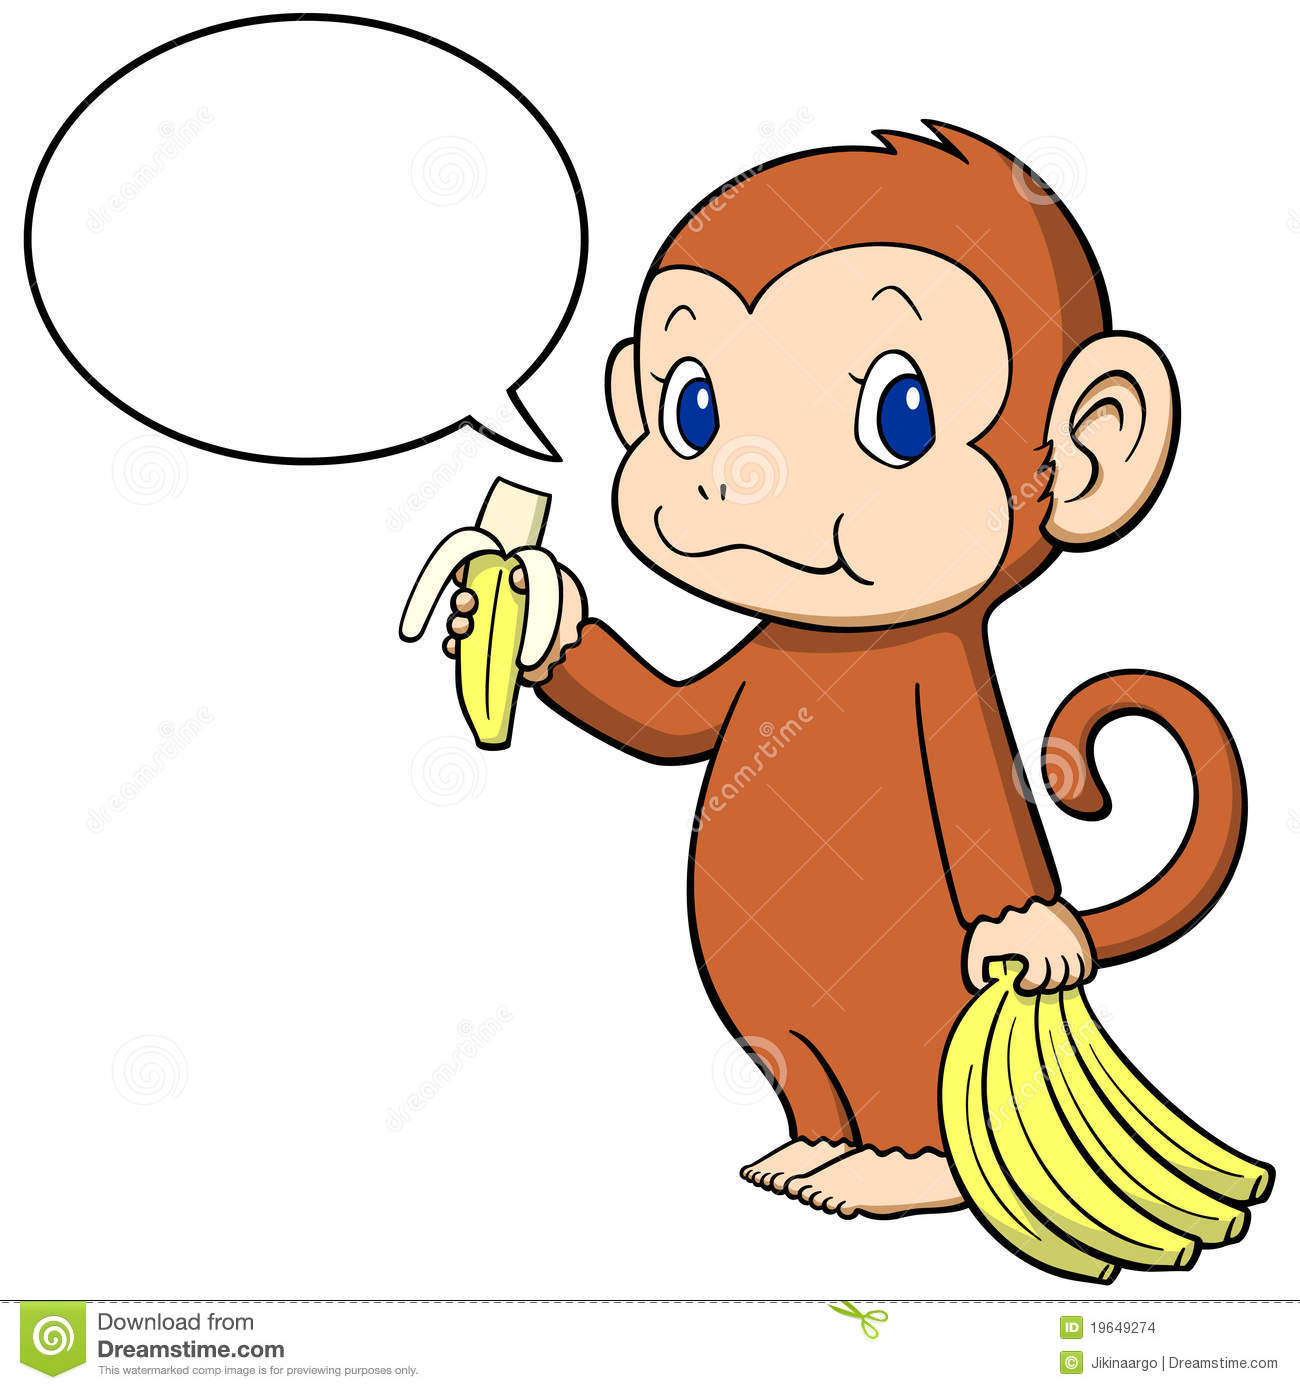 Monkey Eating Banana Clipart.